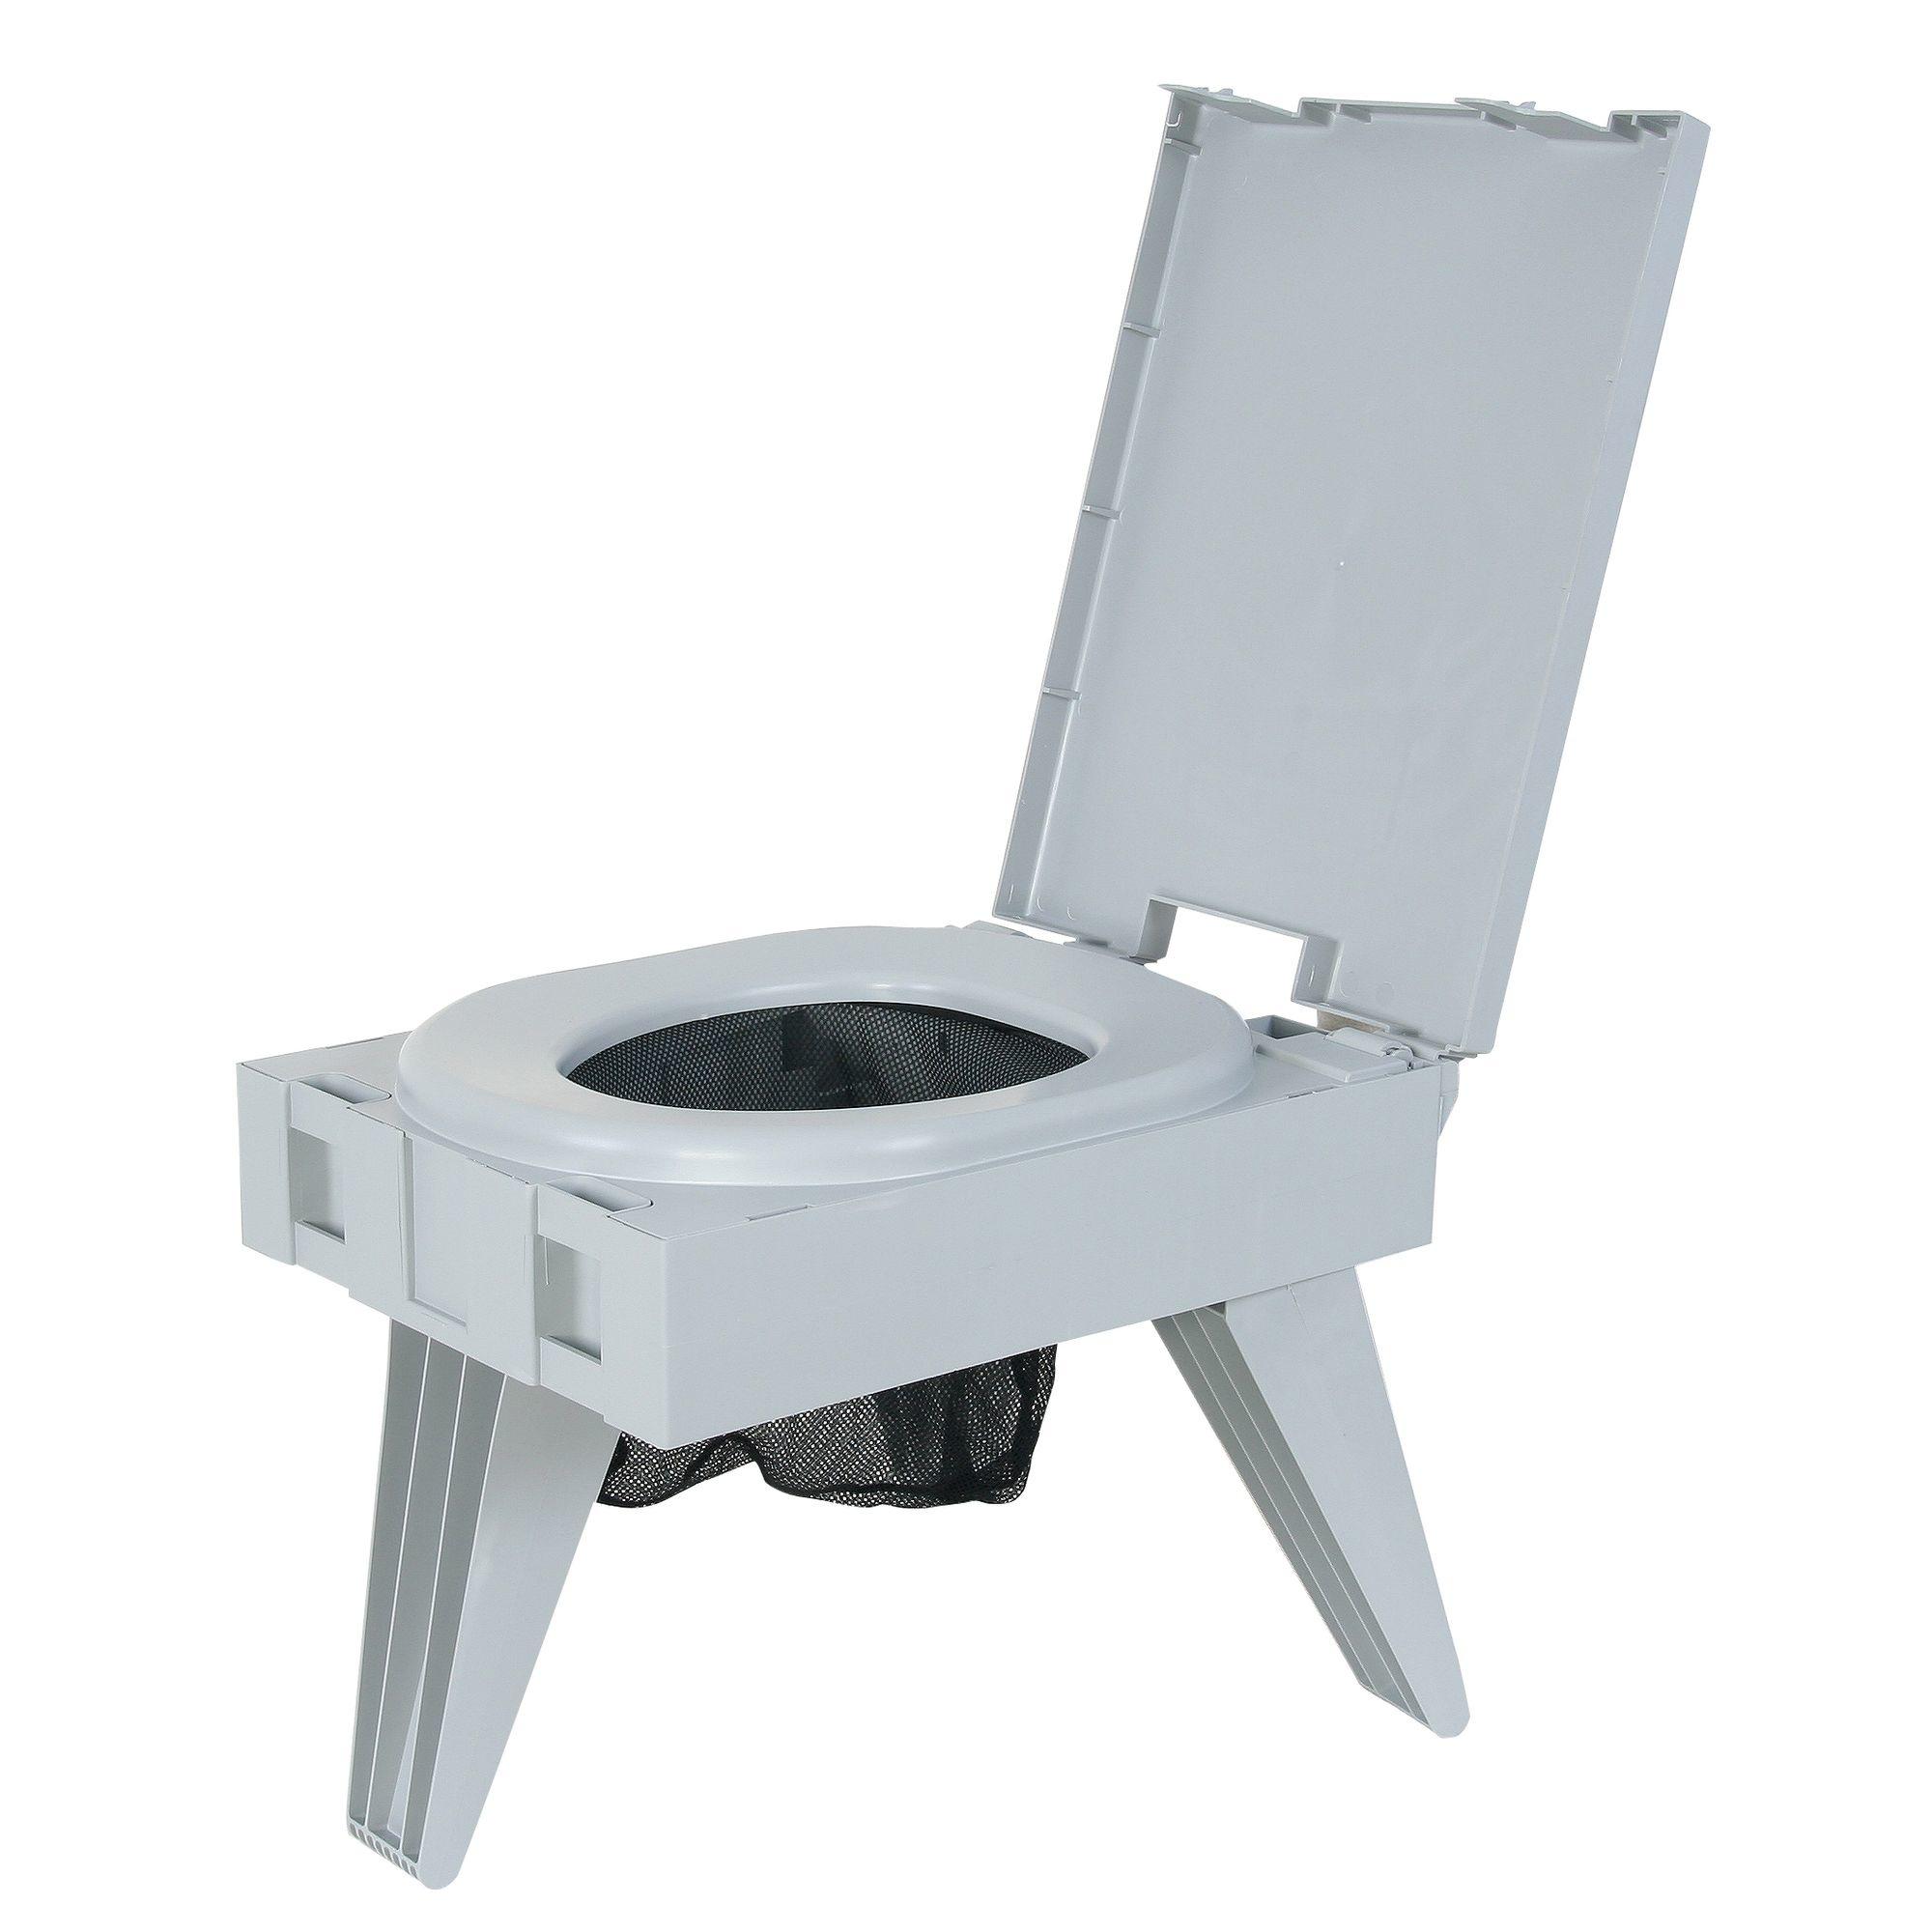 Cleanwaste Cleanwaste Portable Toilet System